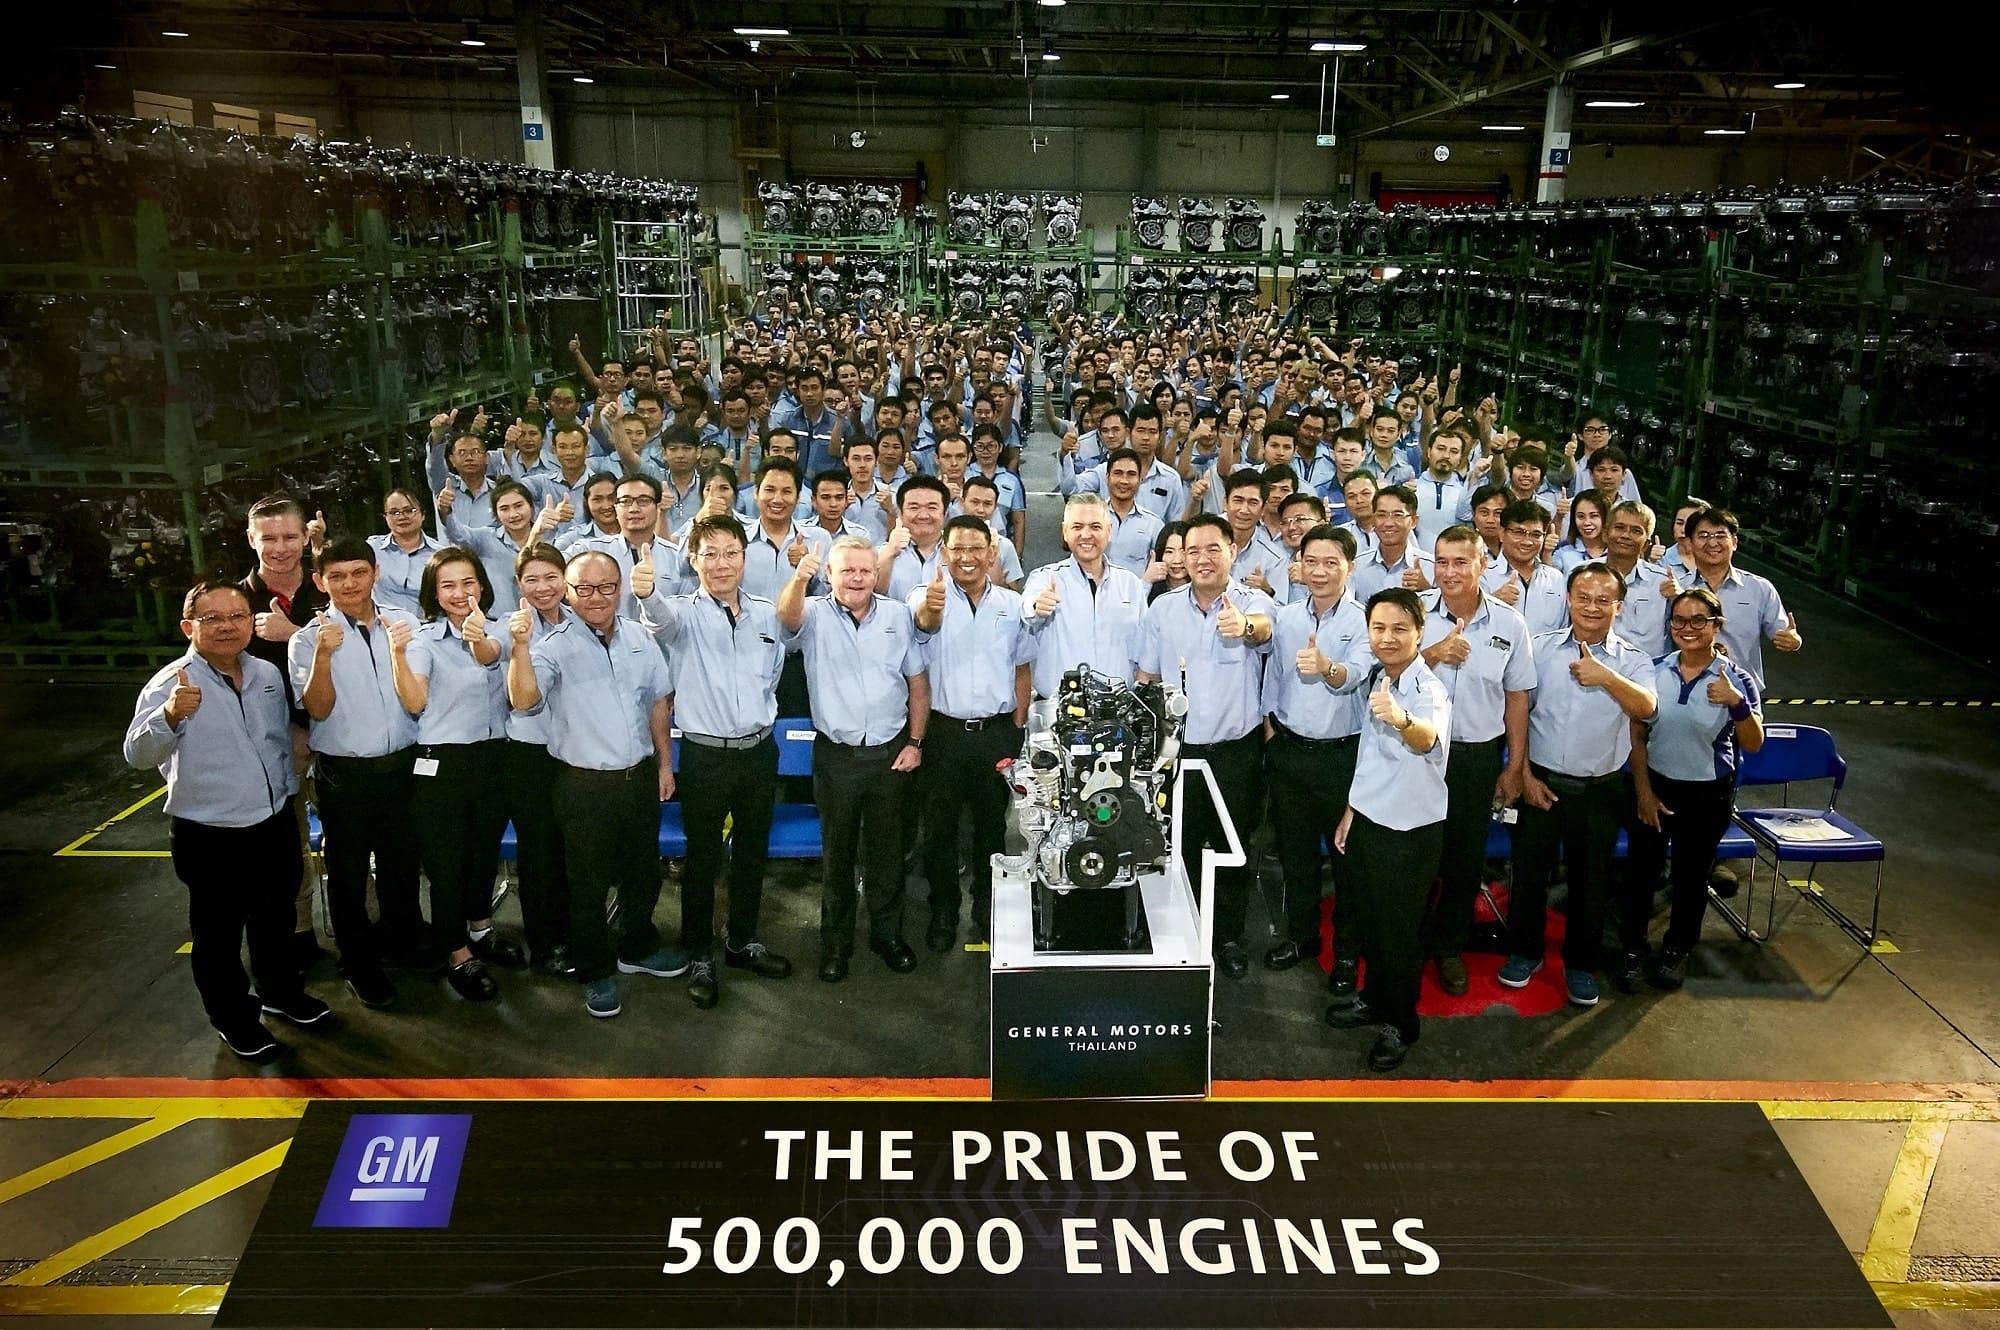 GM Powertrain Thailand Celebrates 500,000th Engine Production Milestone